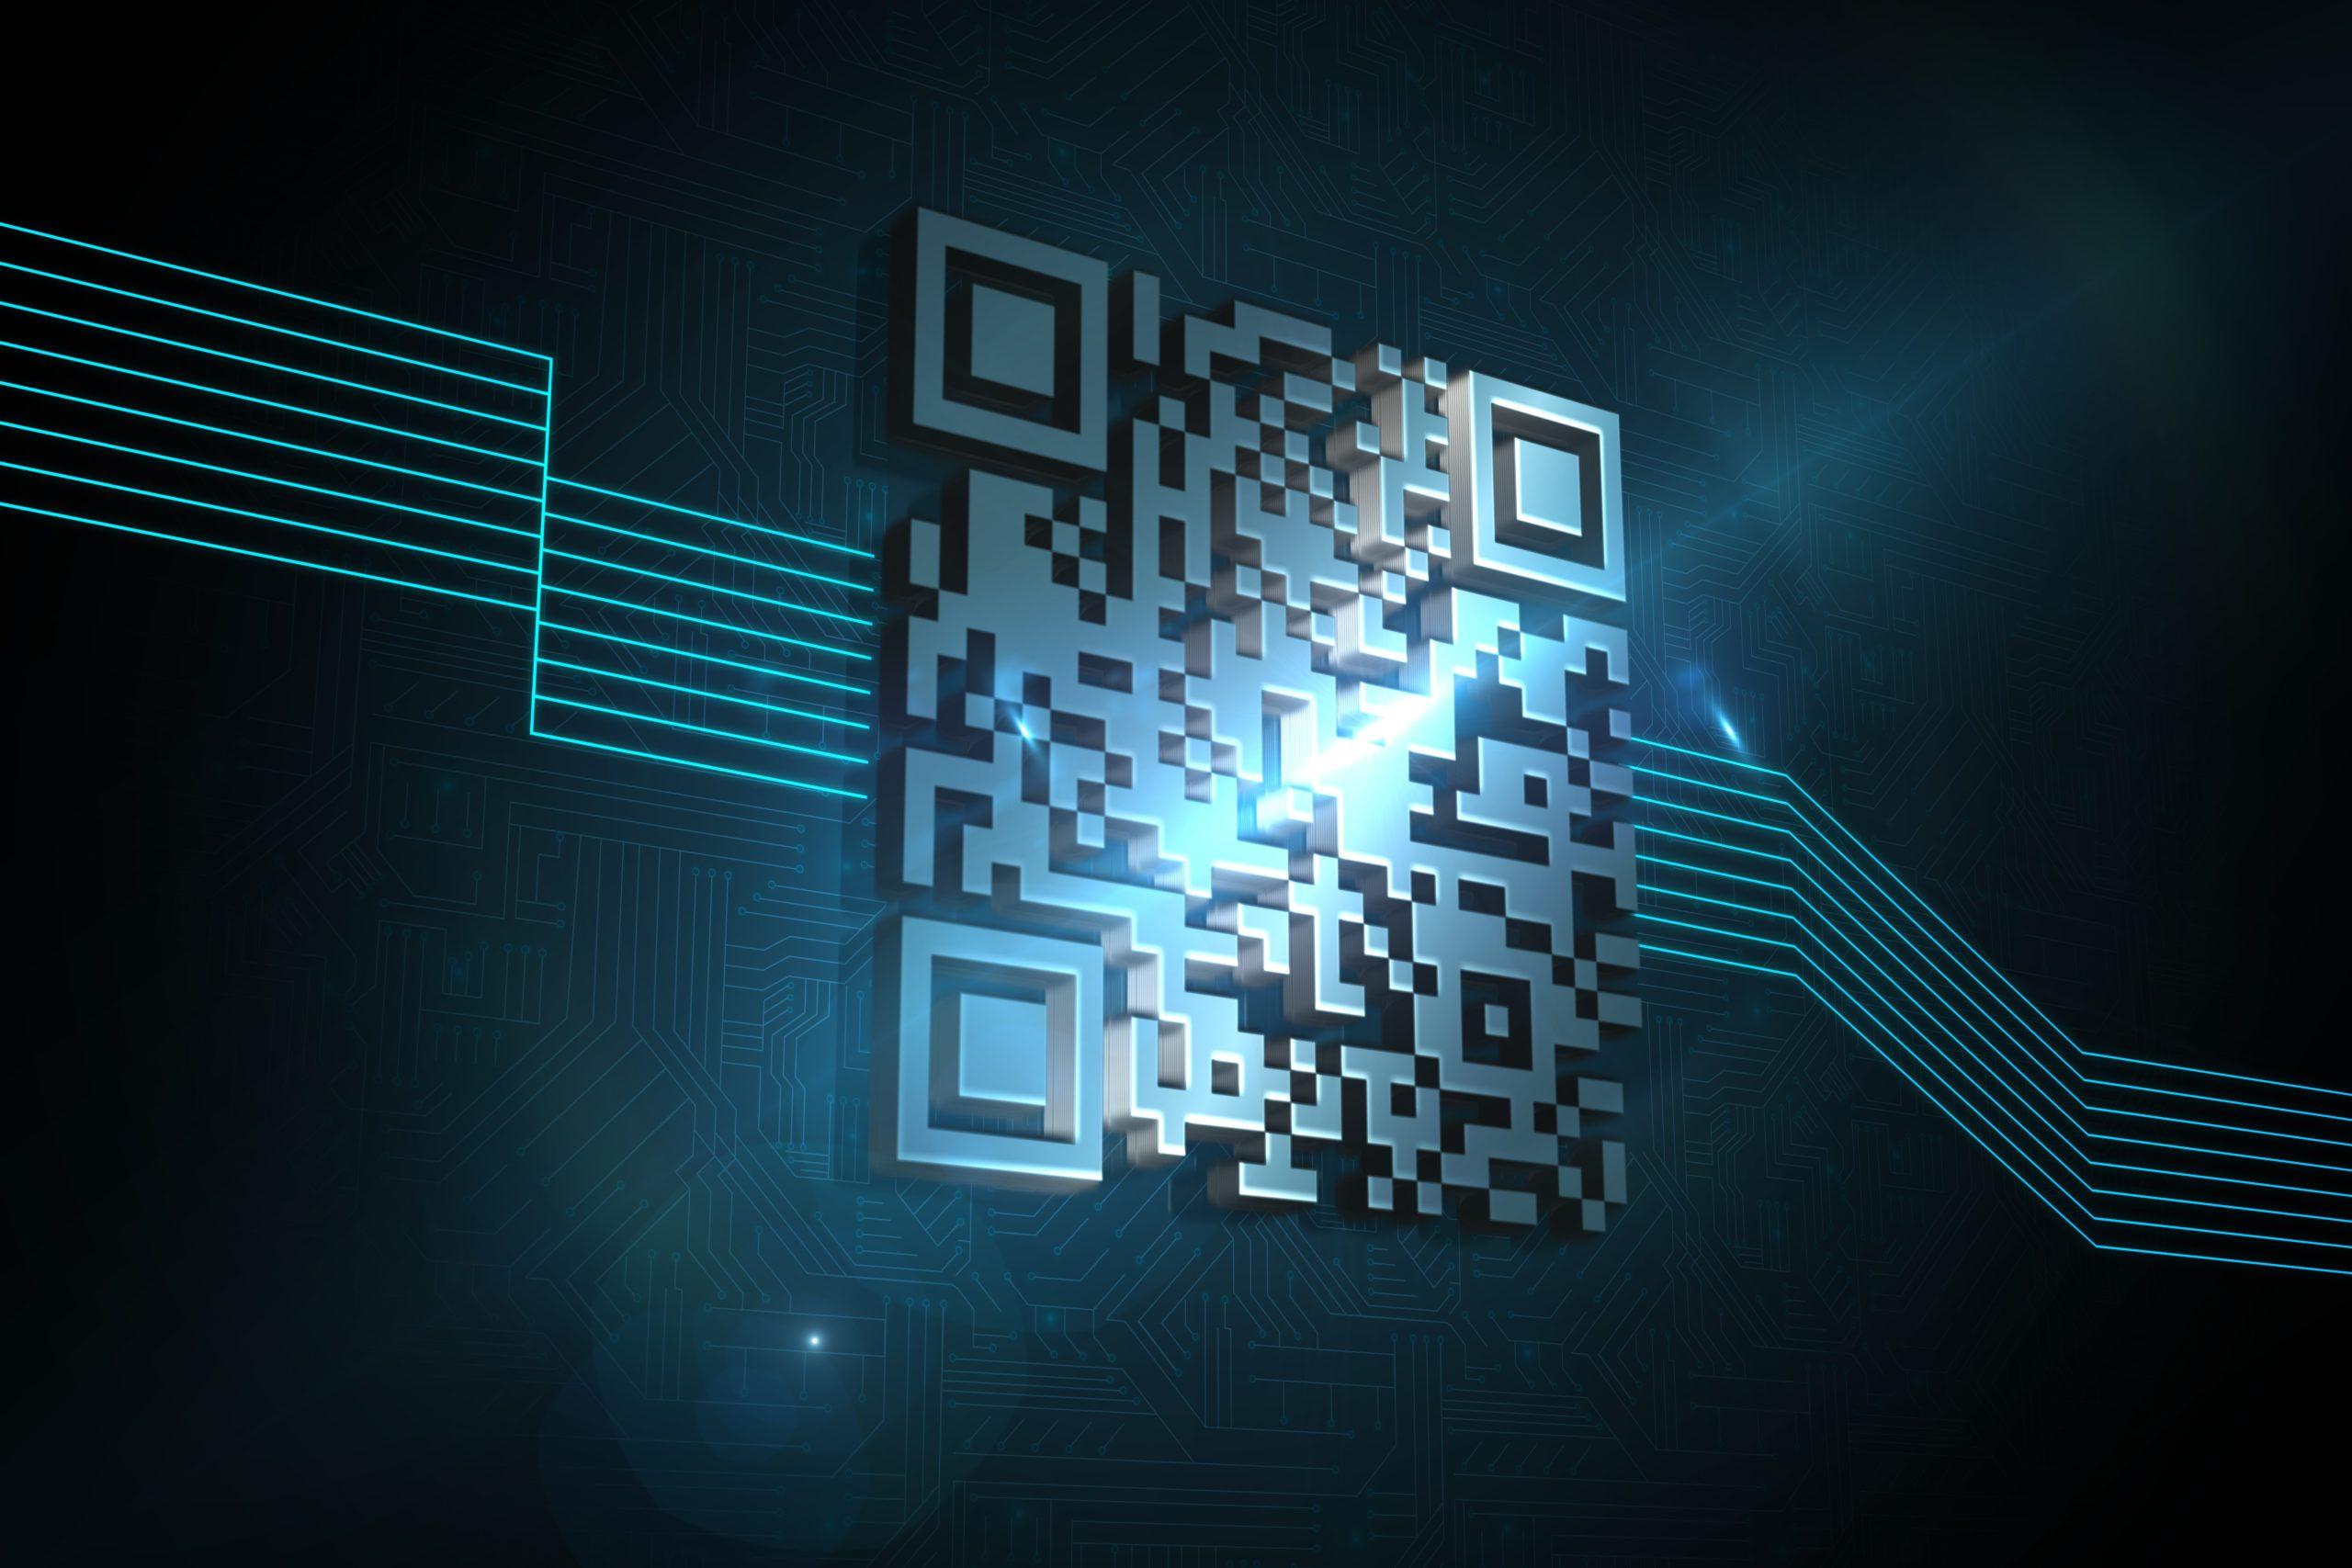 LEONA SN for QR code readability